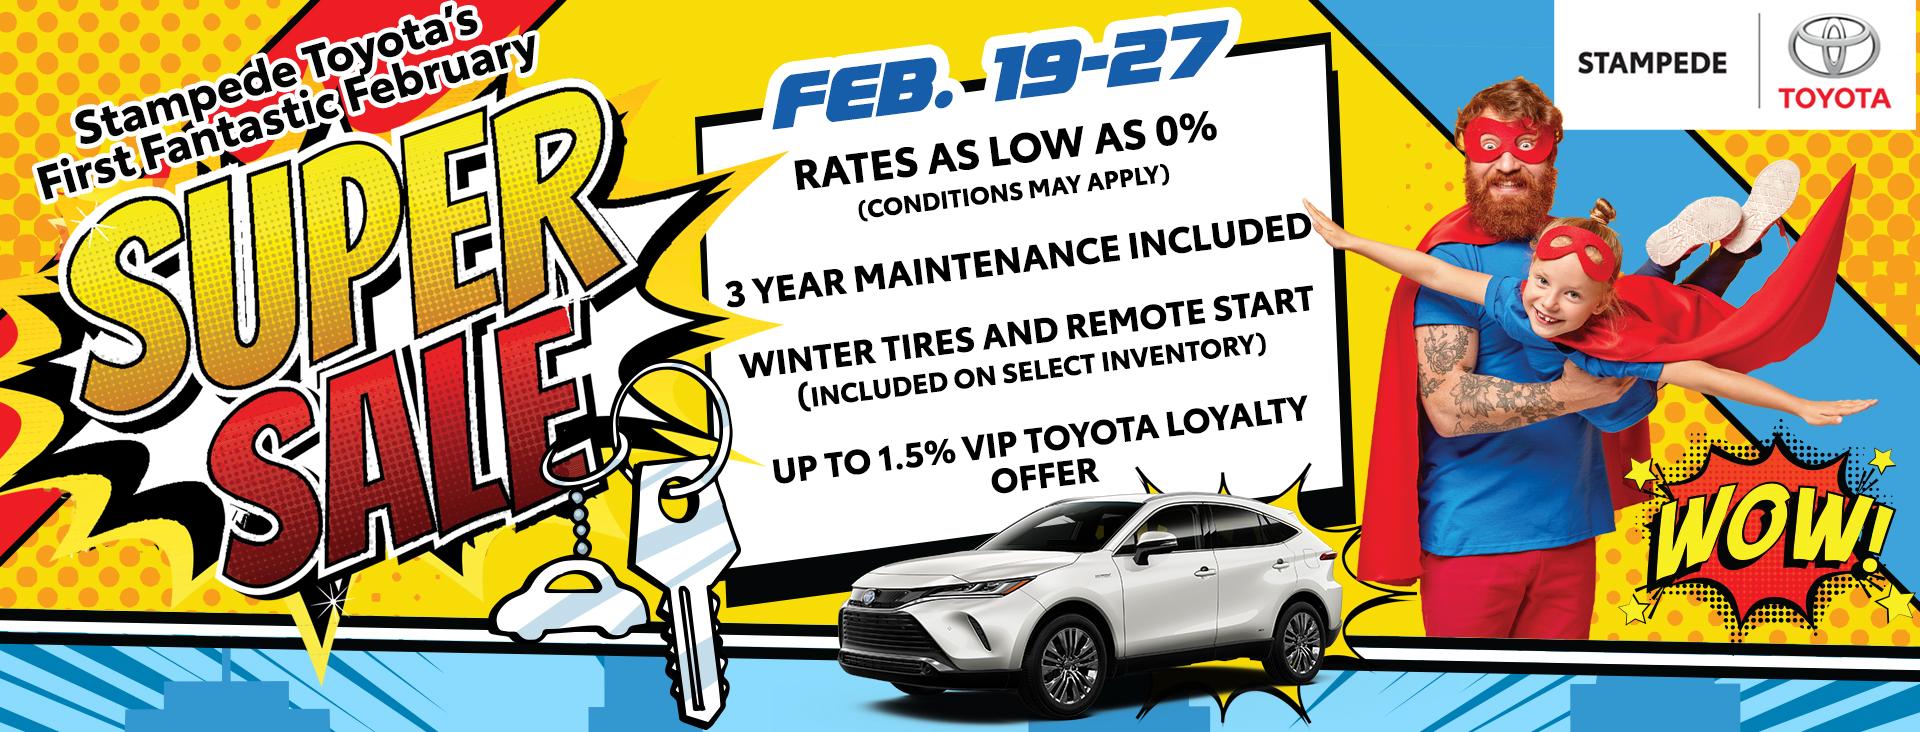 Stampede Toyota's SUPER SALE!